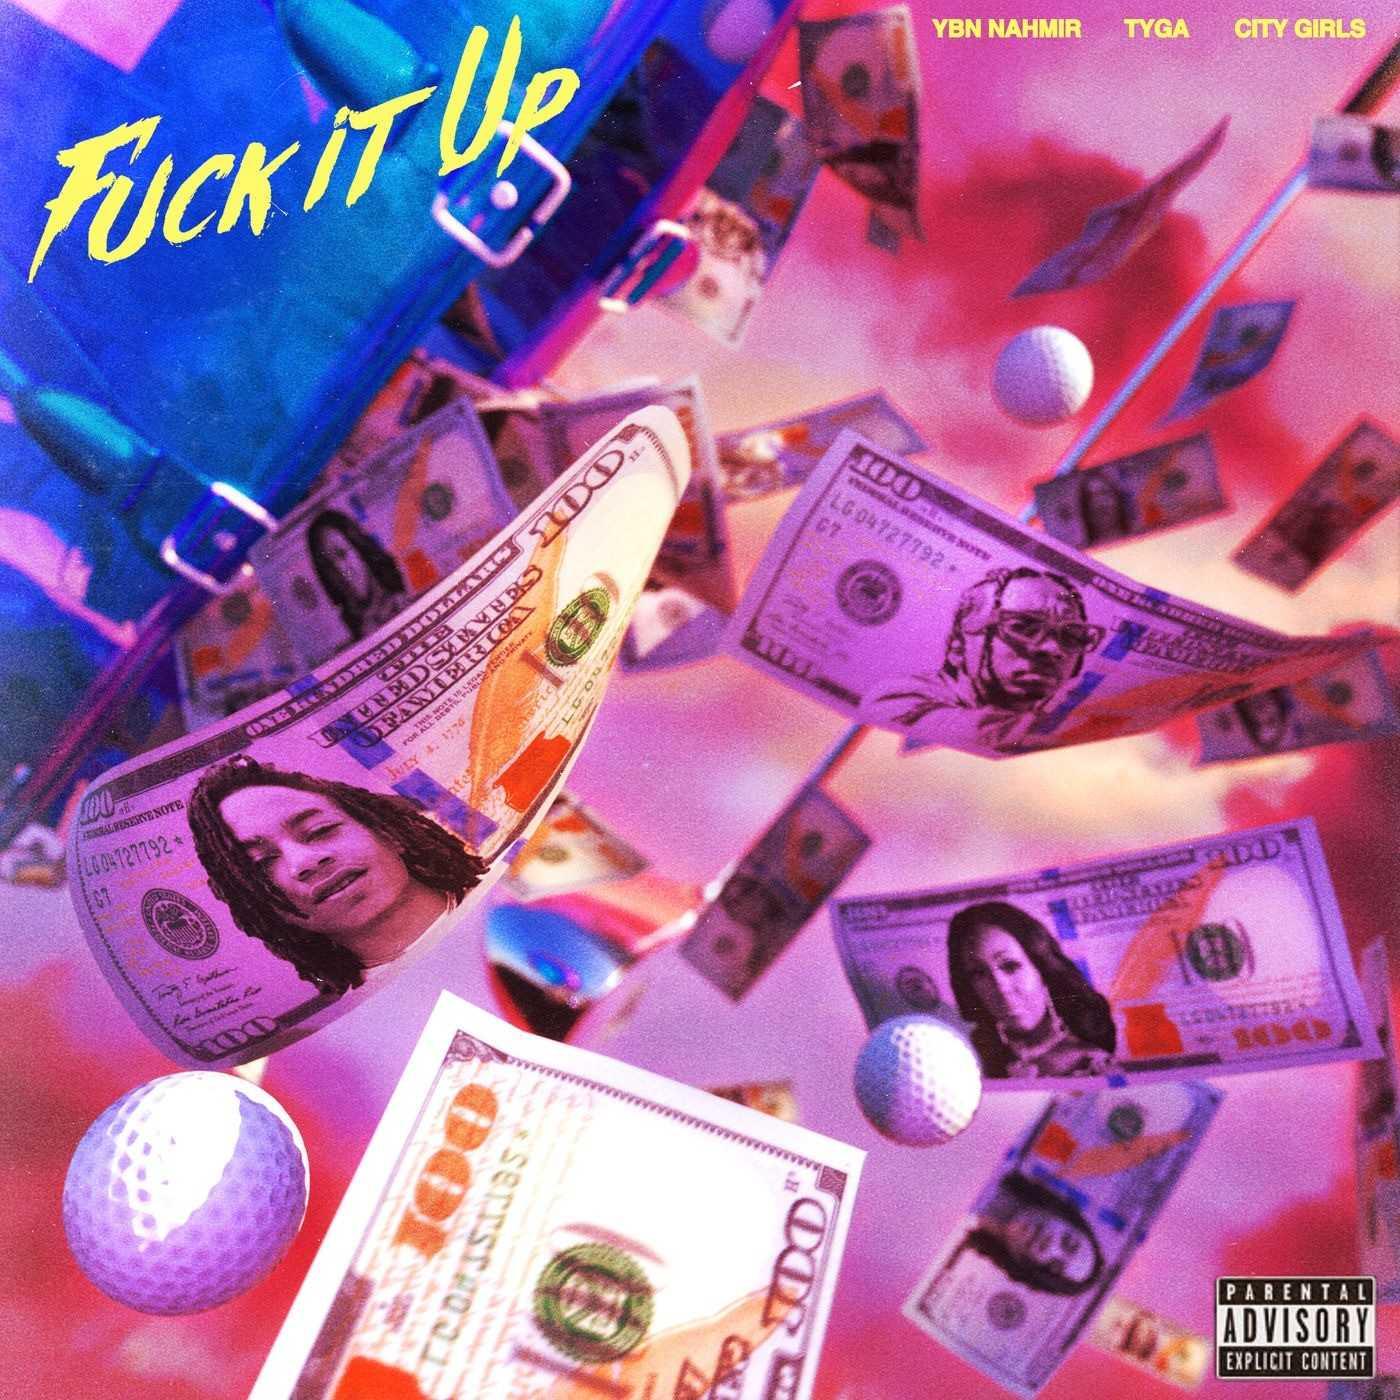 New Single: YBN Nahmir - F**k It Up (feat. City Girls & Tyga) [Audio]